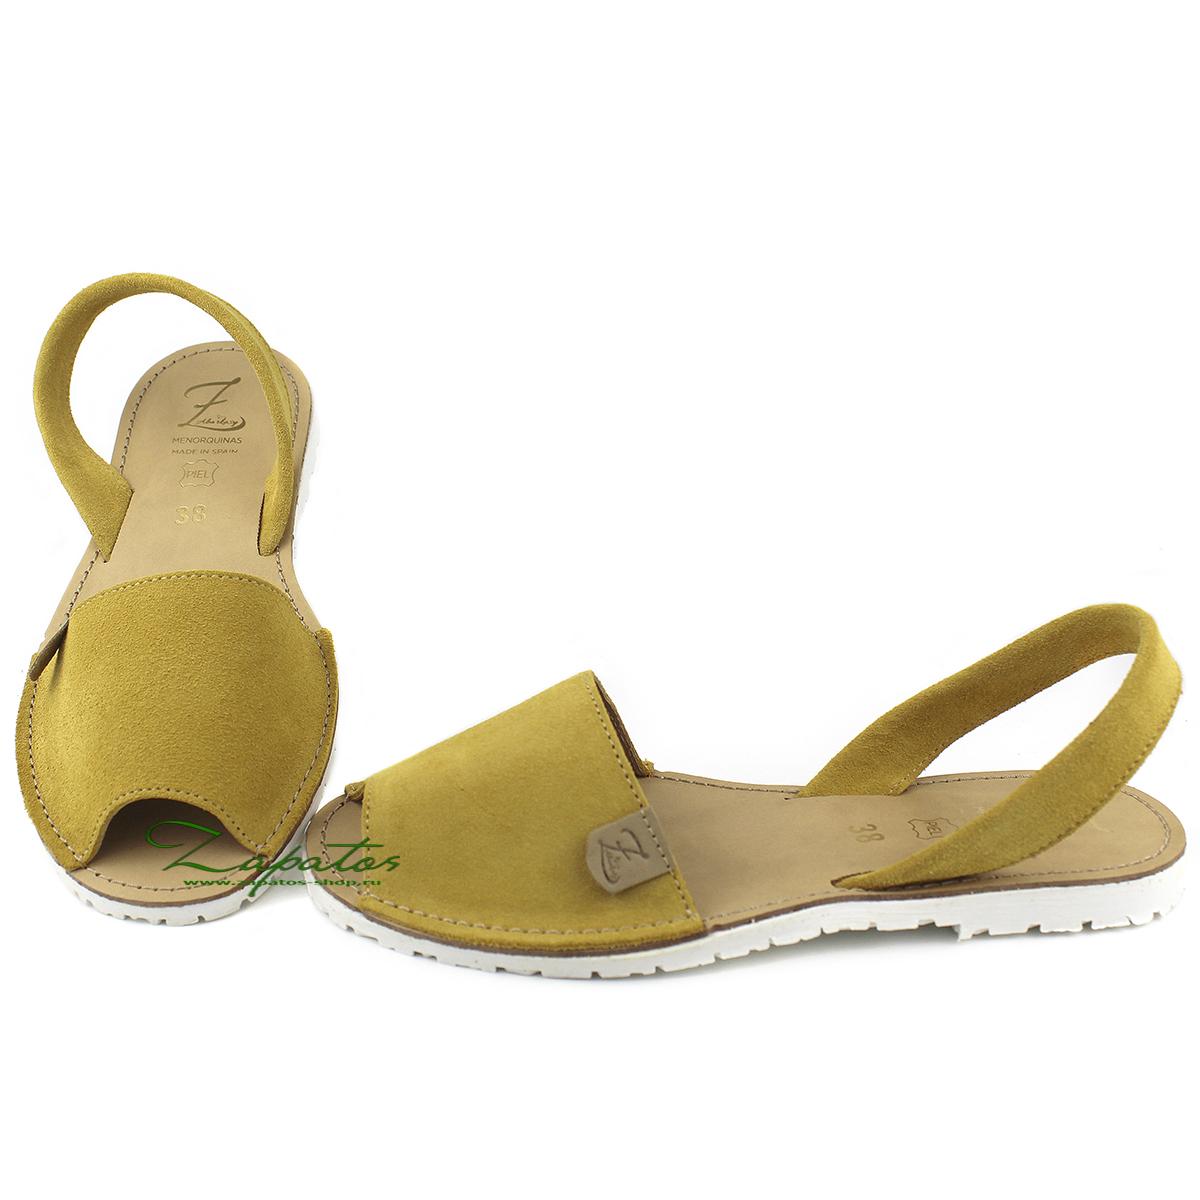 Абаркасы AB. Zapatos 3206 Ocra -blanco